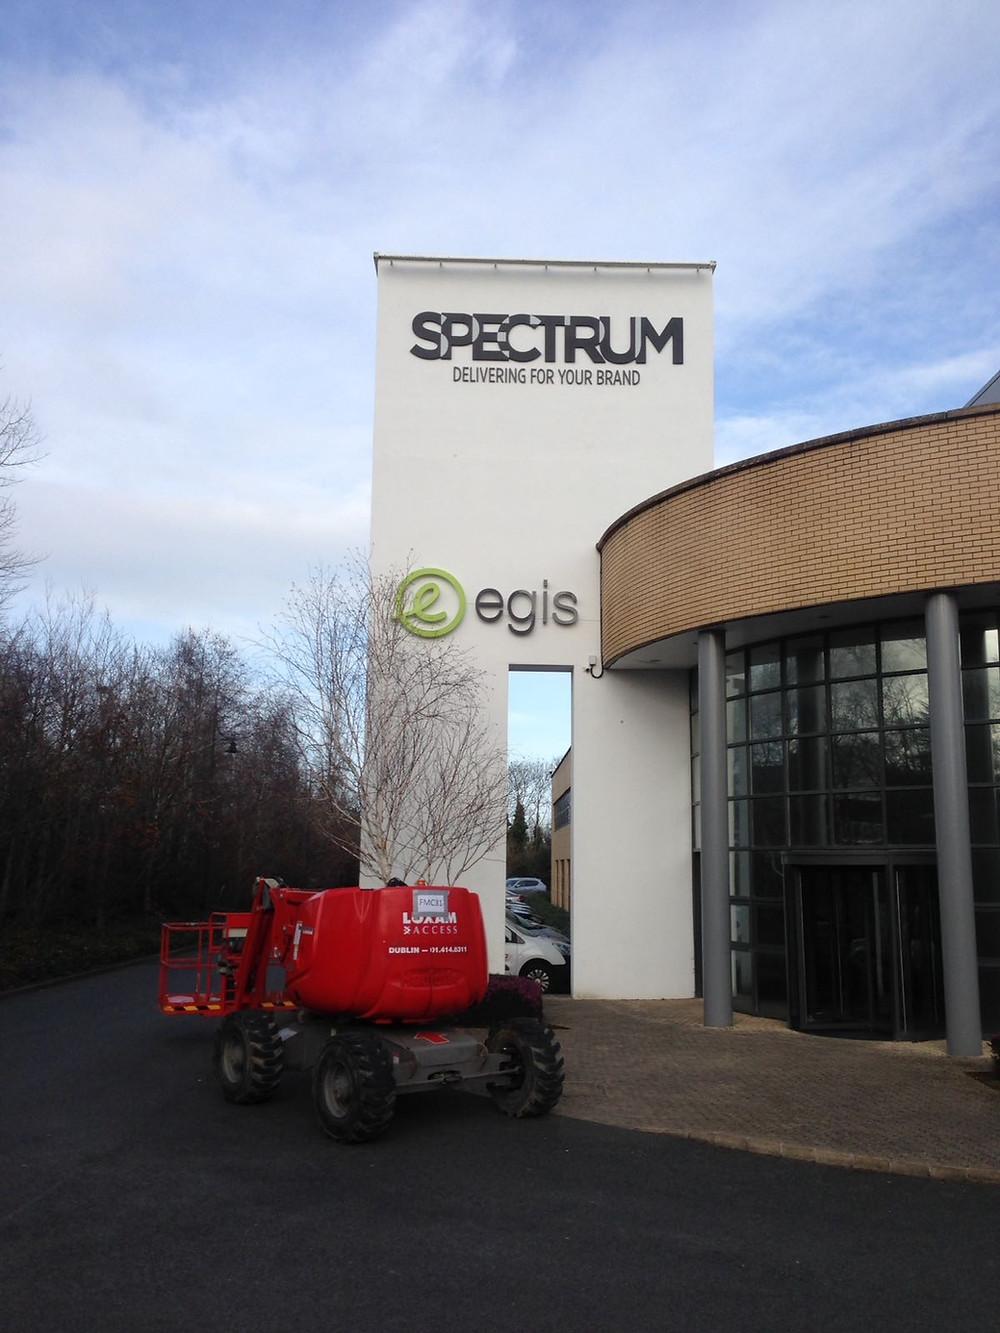 Industrial high spec large metal light up lettering